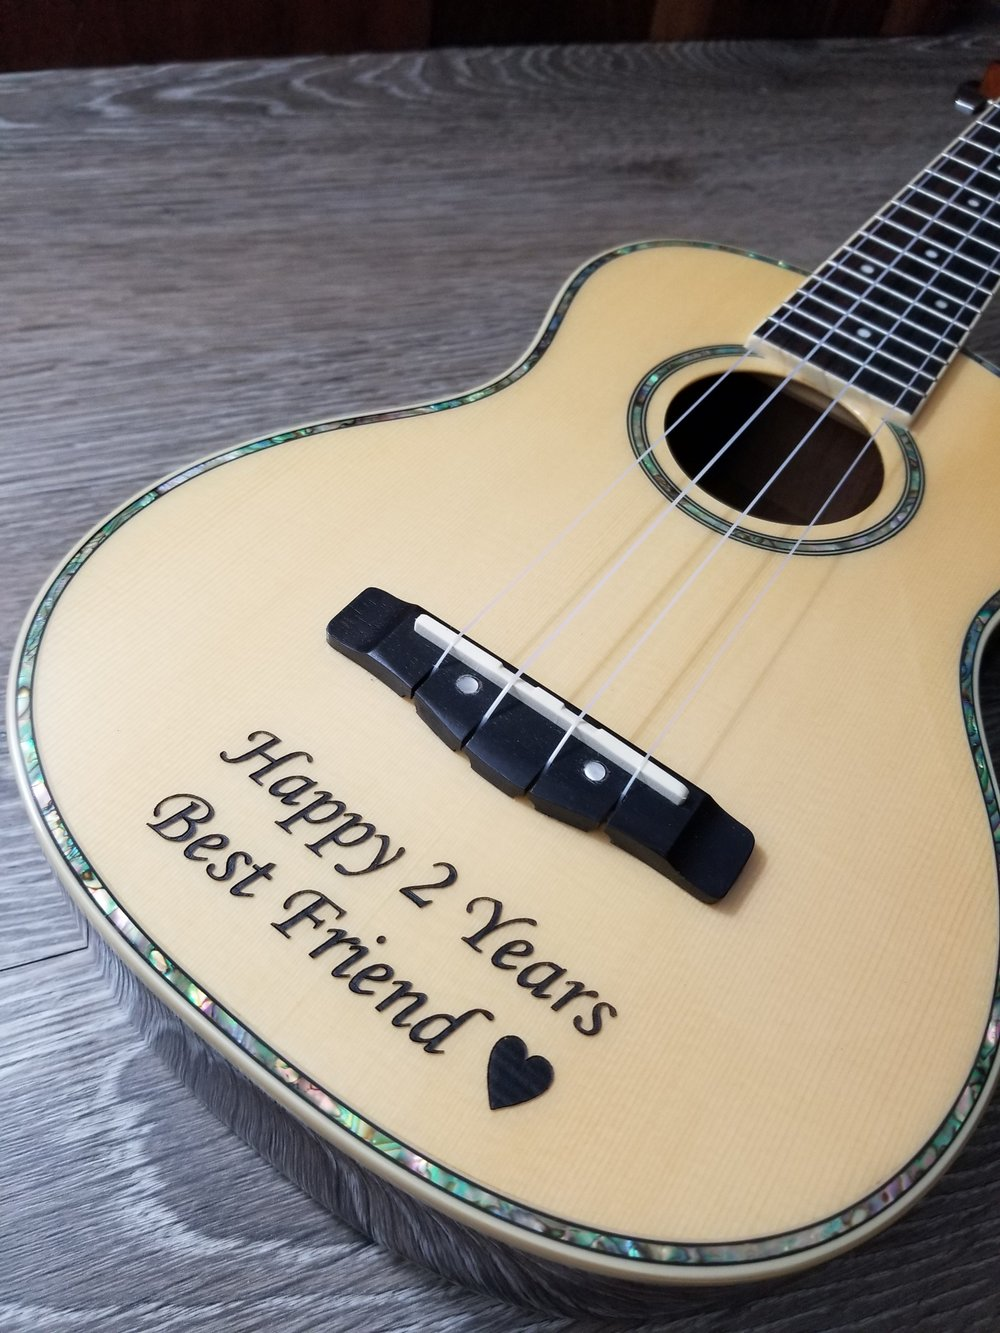 Copy of Engraved Guitar - Engraved Ukulele - Engraved instruments - Personalized Guitar - Personalized Ukulele - Custom Ukulele - Instrument Engraving - Custom Instruments - Engrave It Houston